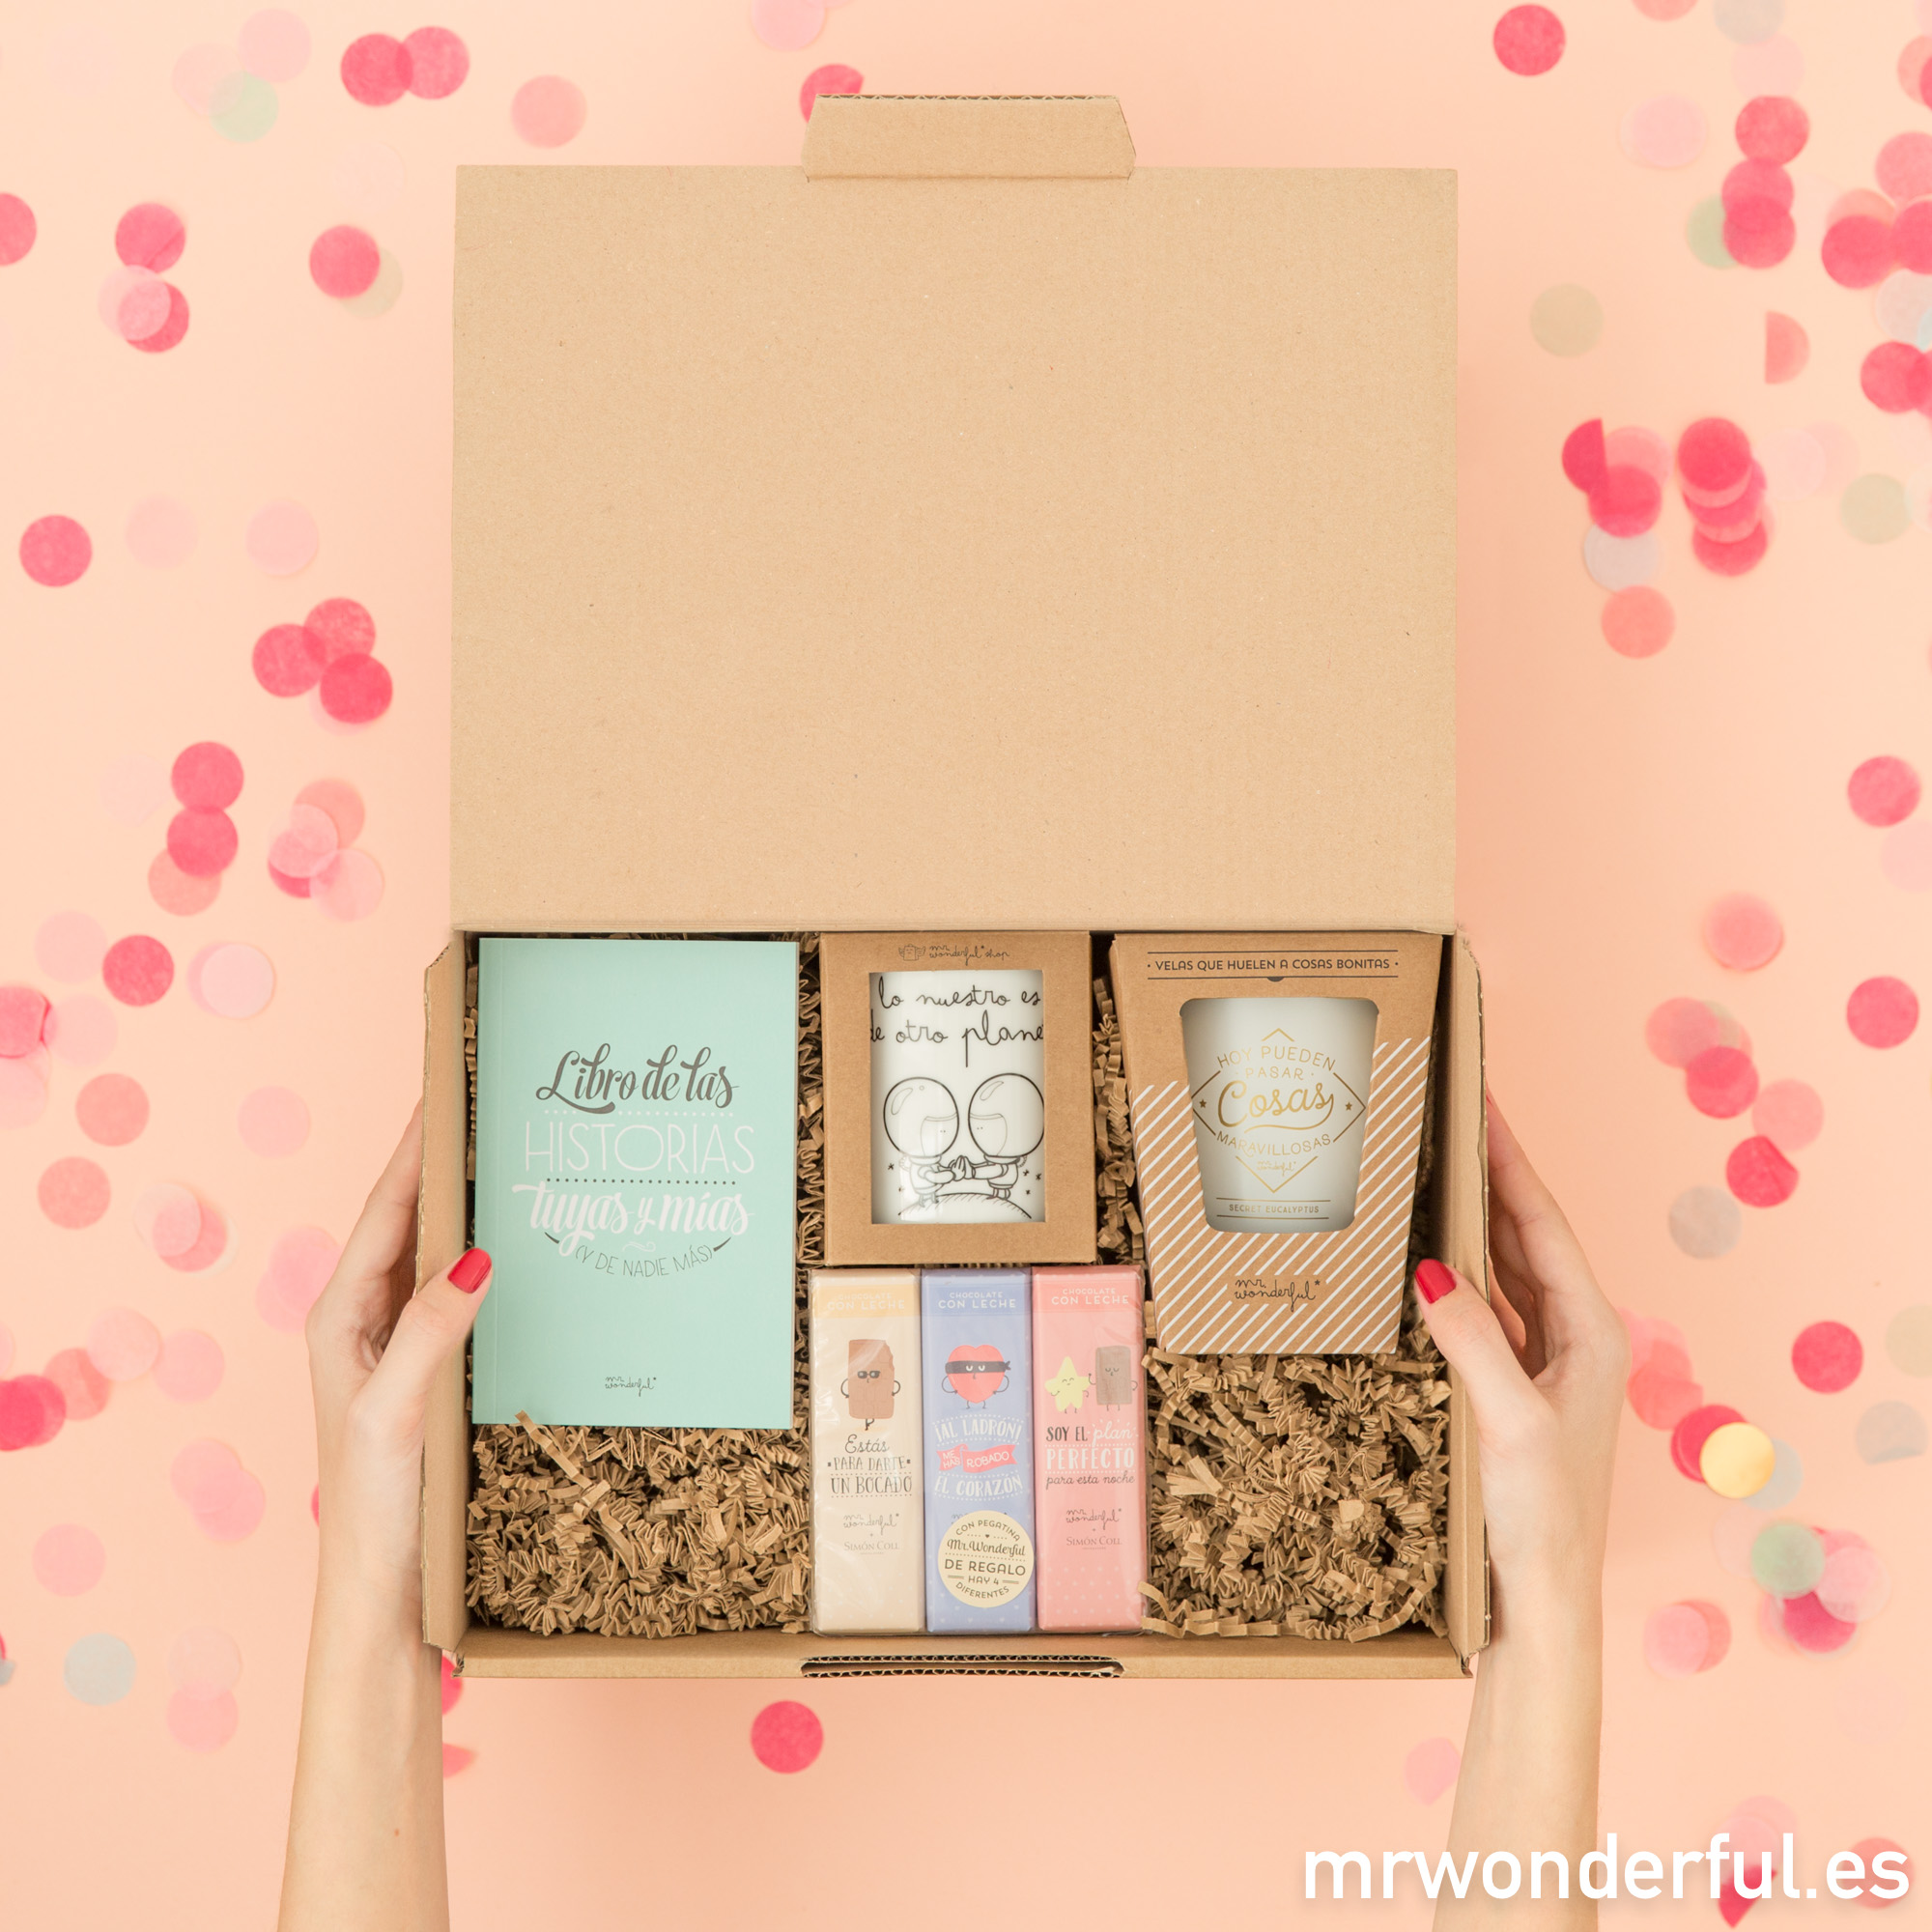 mrwonderful_kits-san-valentin_2017-16-editar-editar